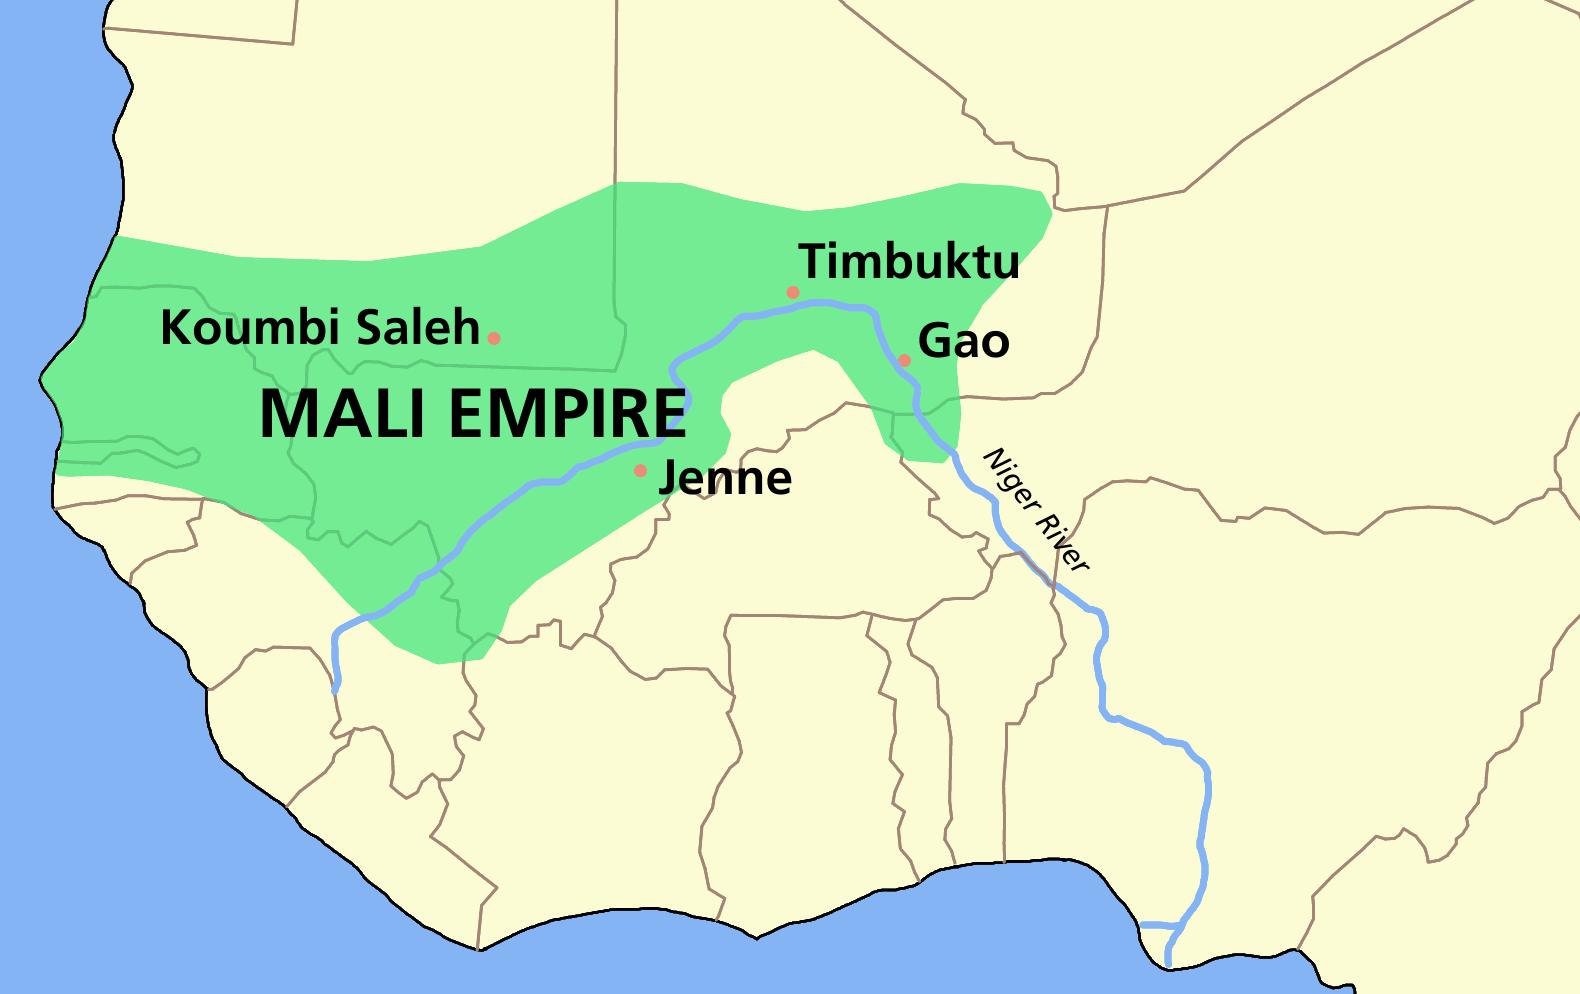 File:MALI empire map.PNG - Wikimedia Commons